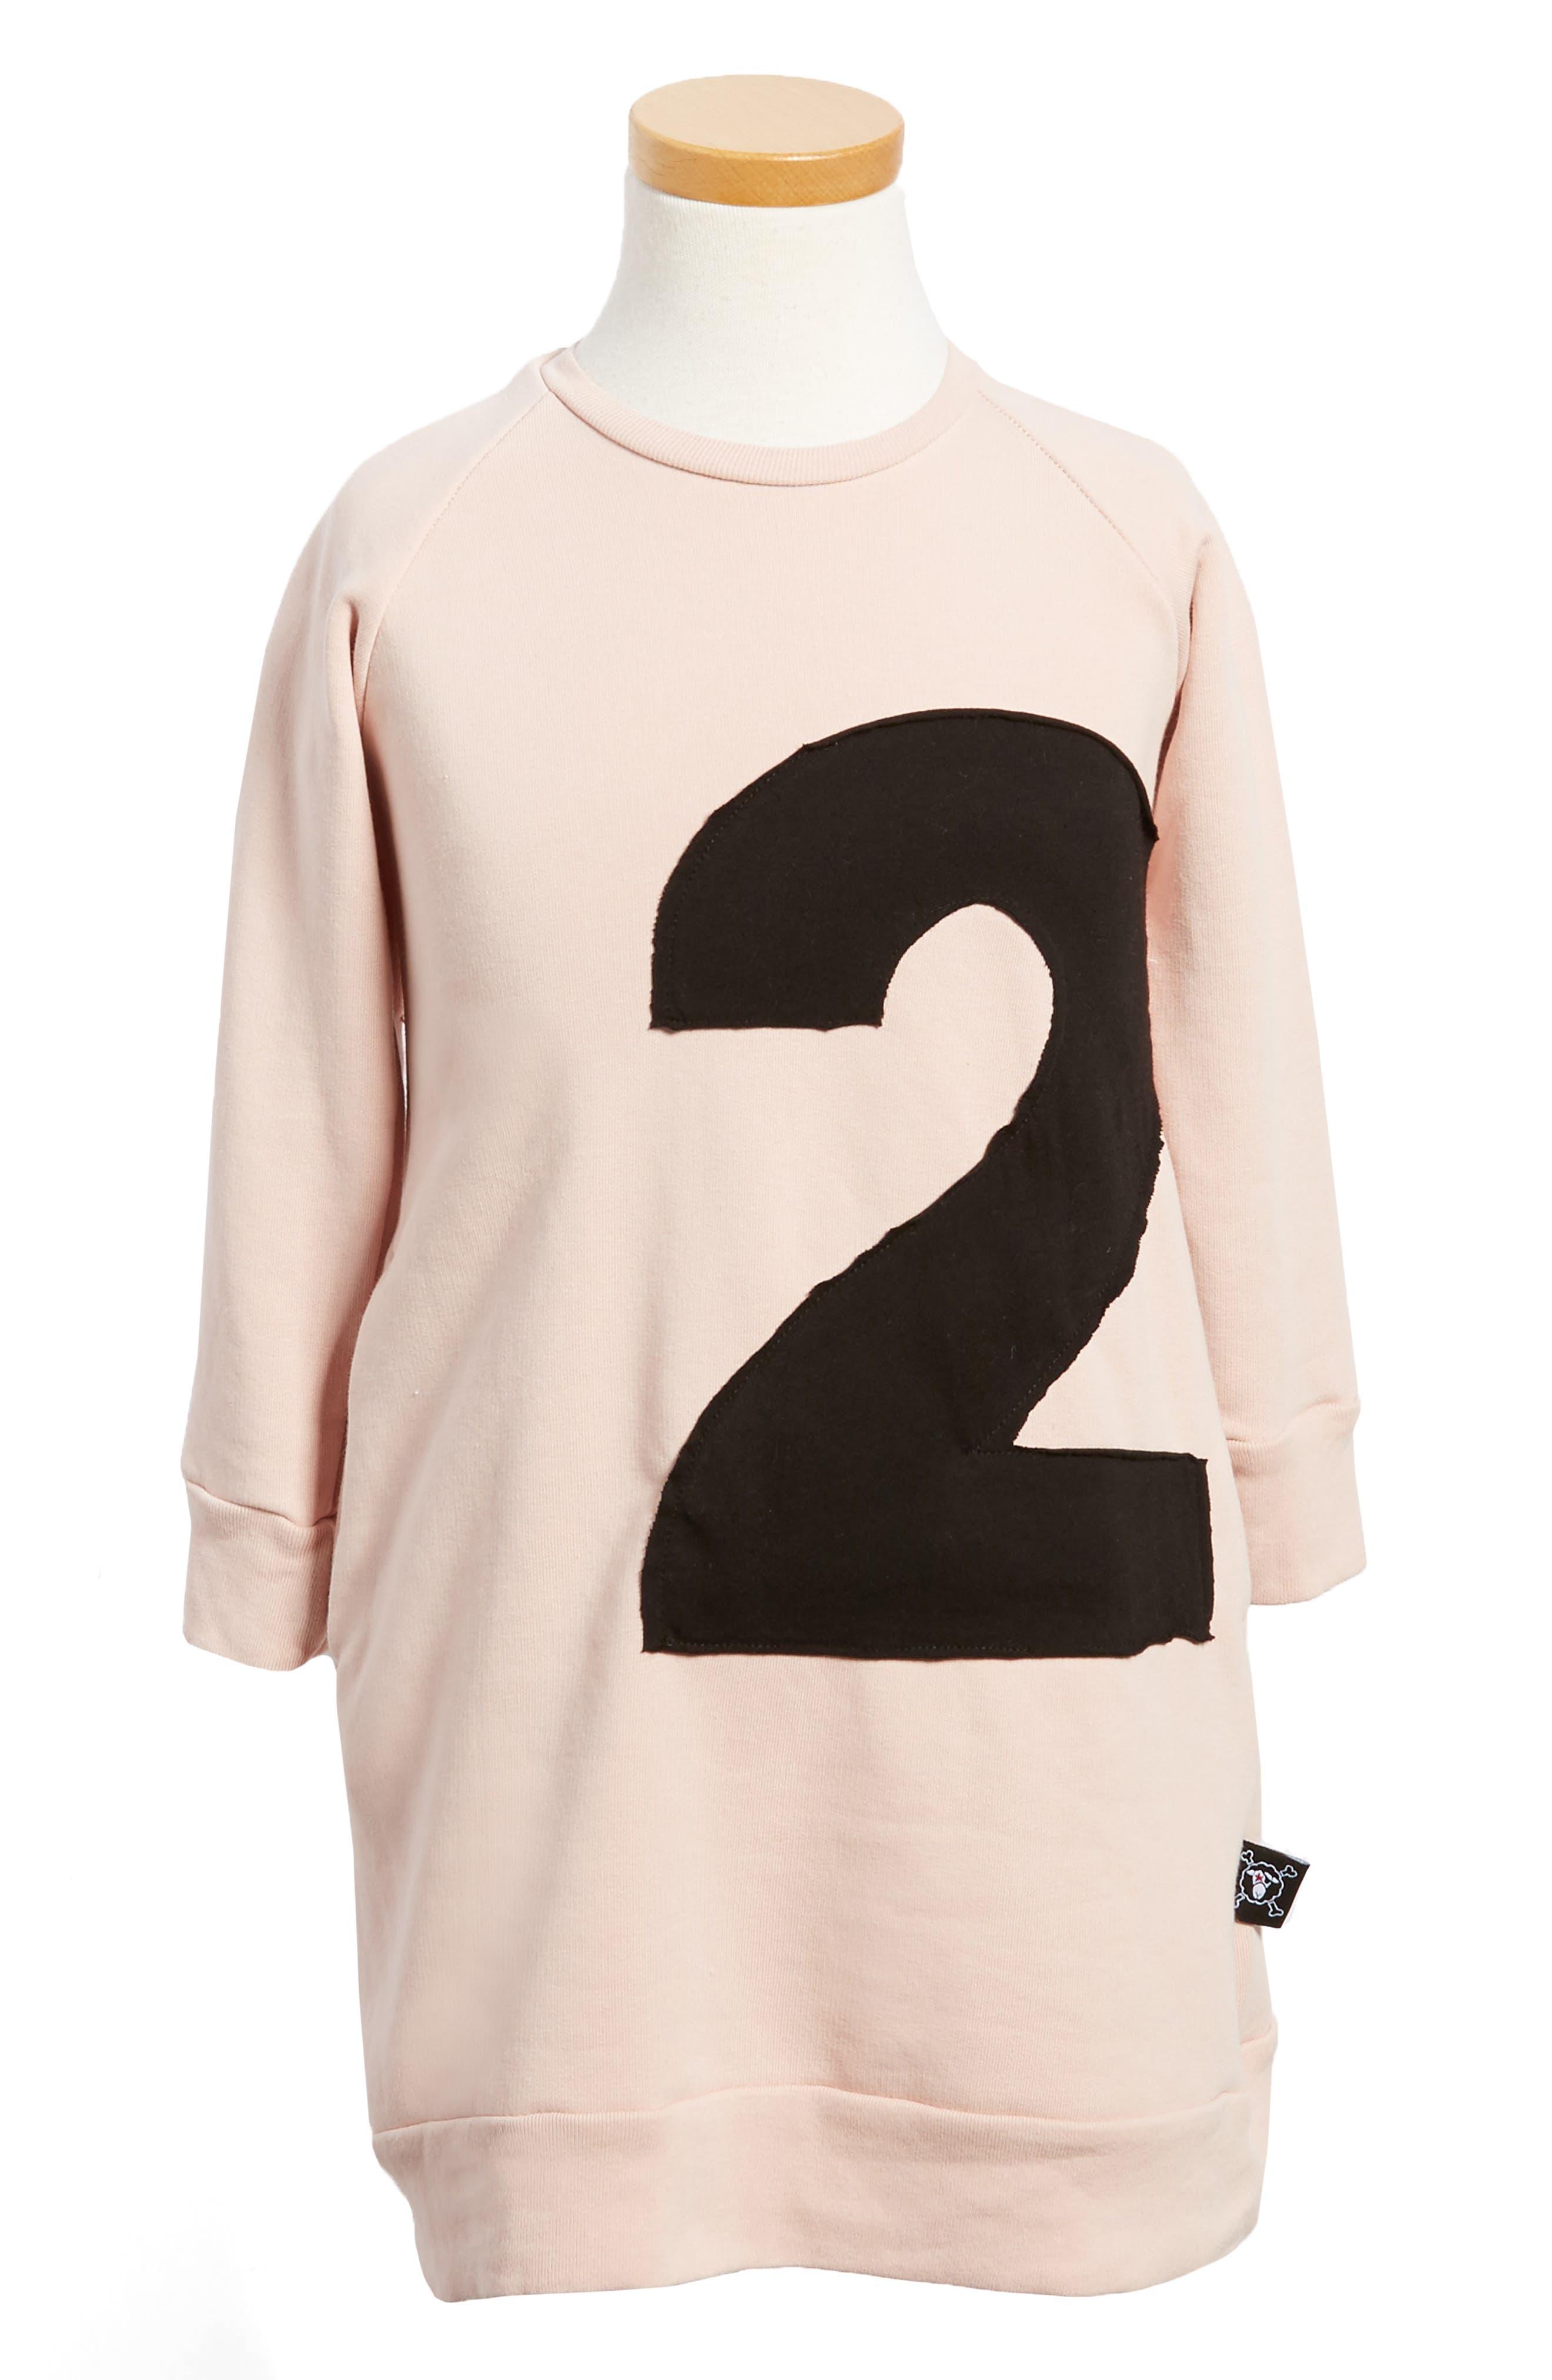 Alternate Image 1 Selected - NUNUNU Puffy Number Sweashirt Dress (Toddler Girls & Little Girls)